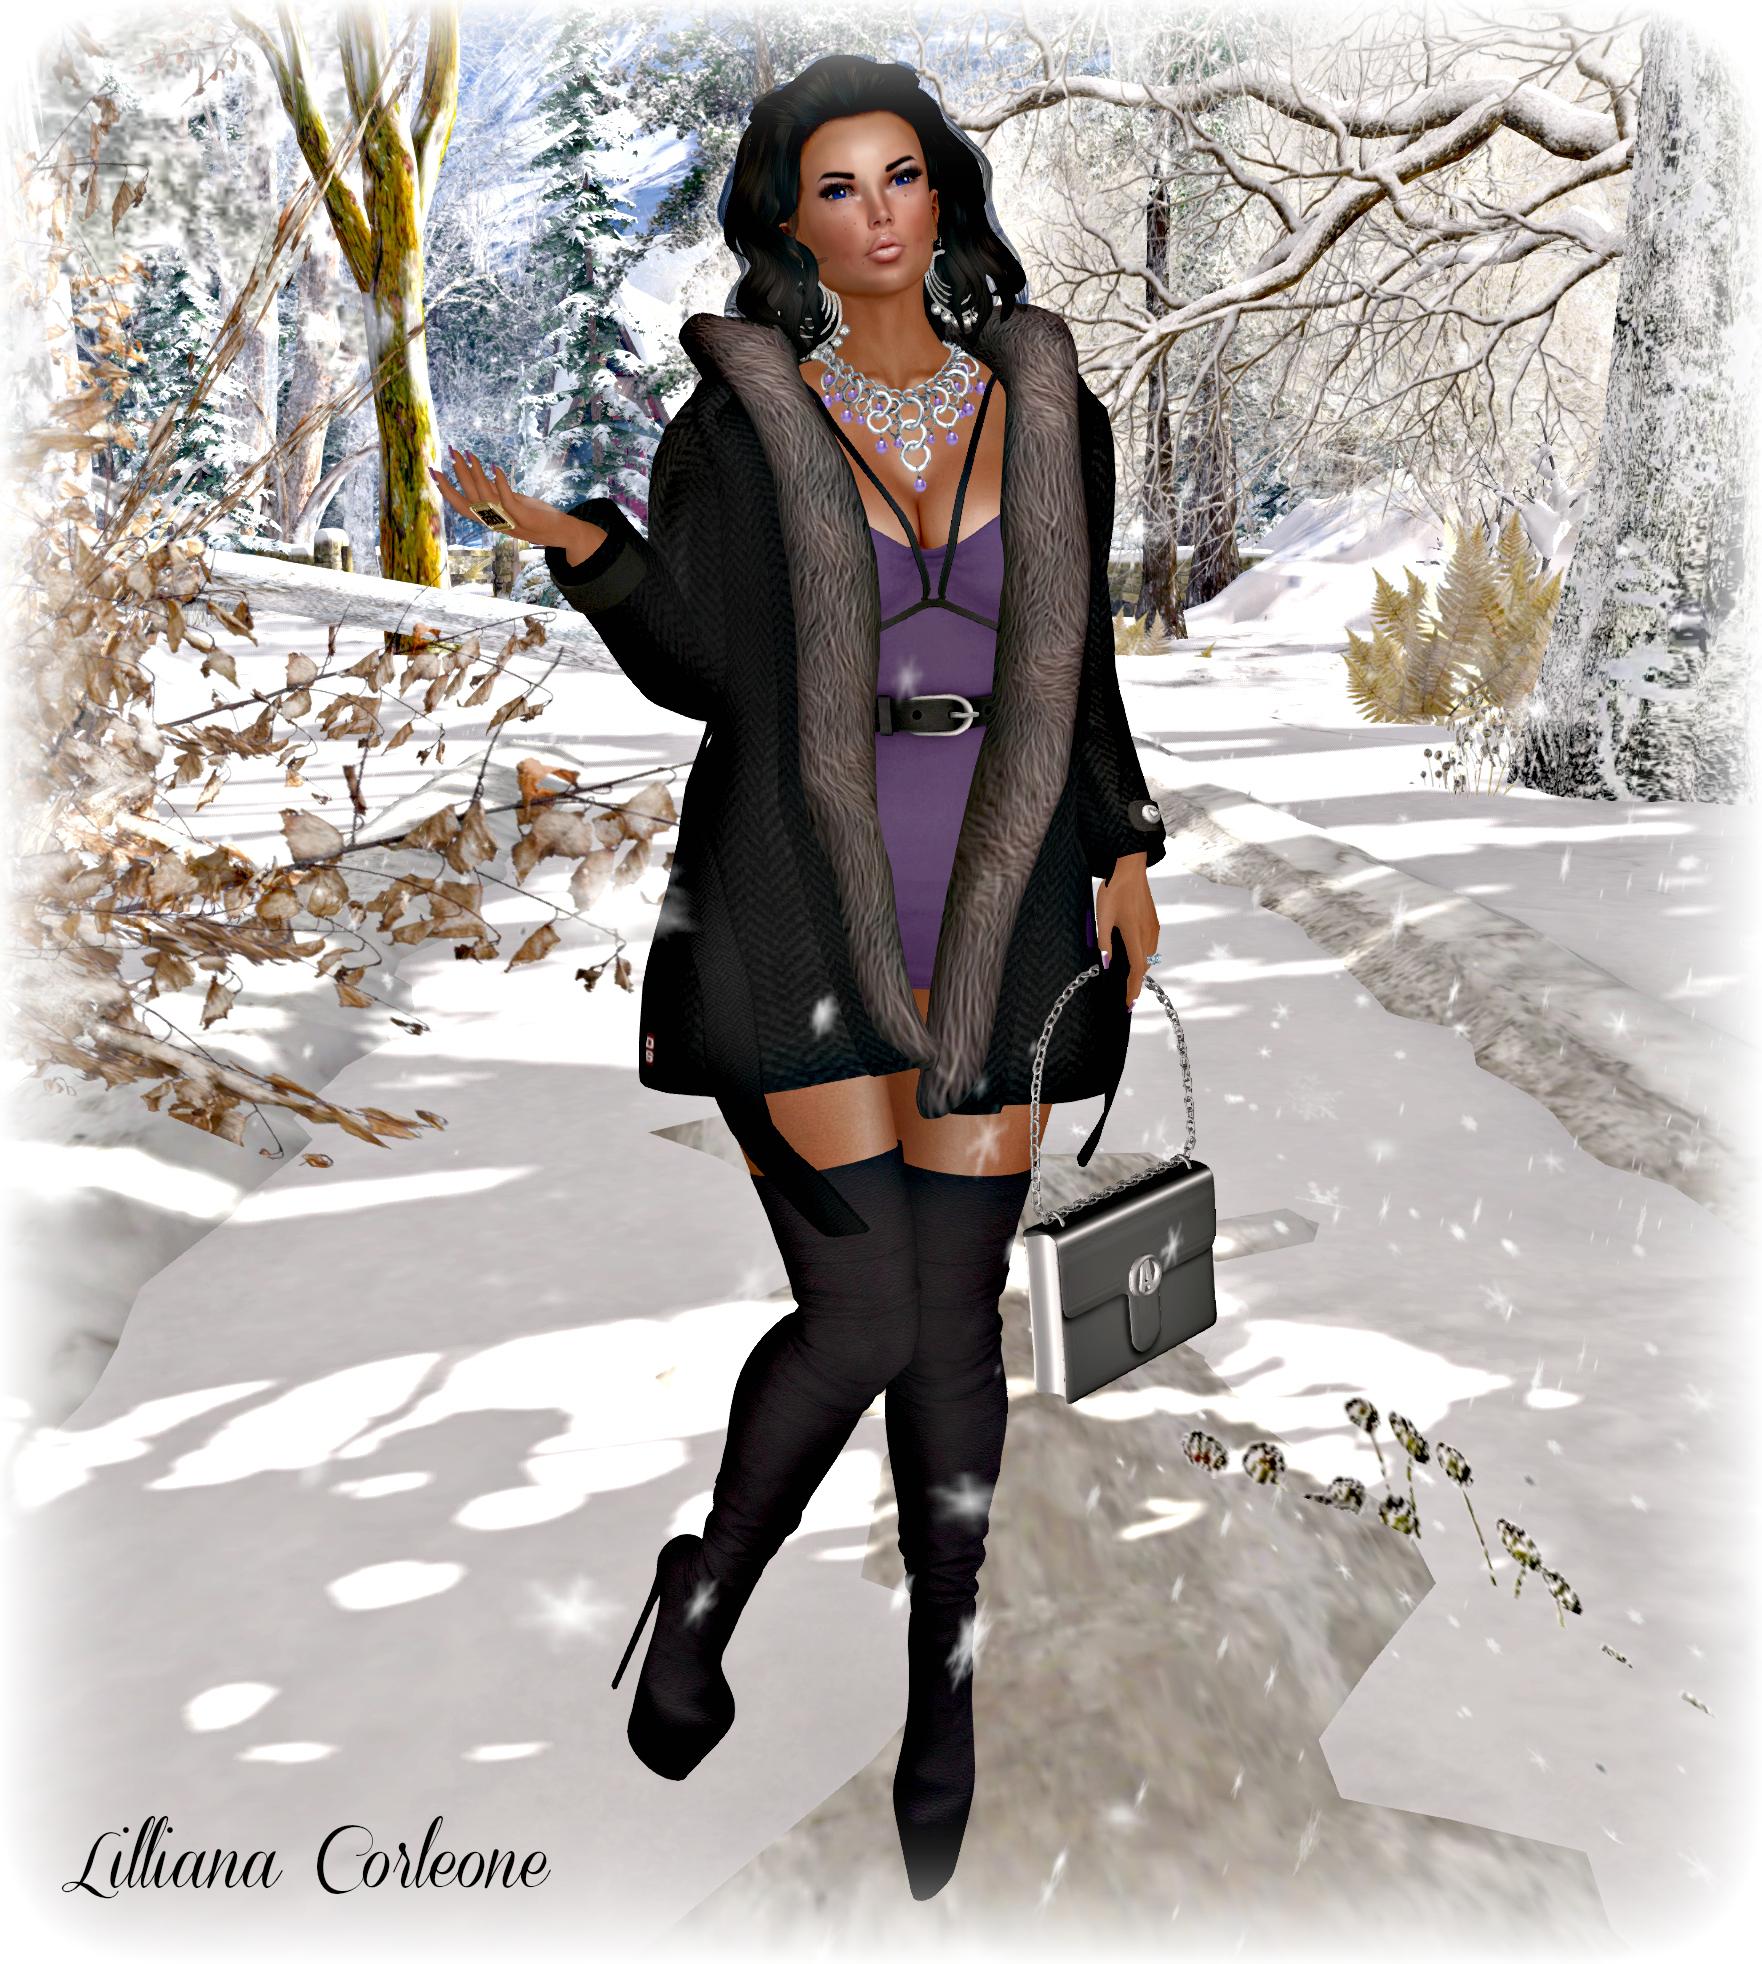 december-29th-blog-post-photo-3_croppedv2